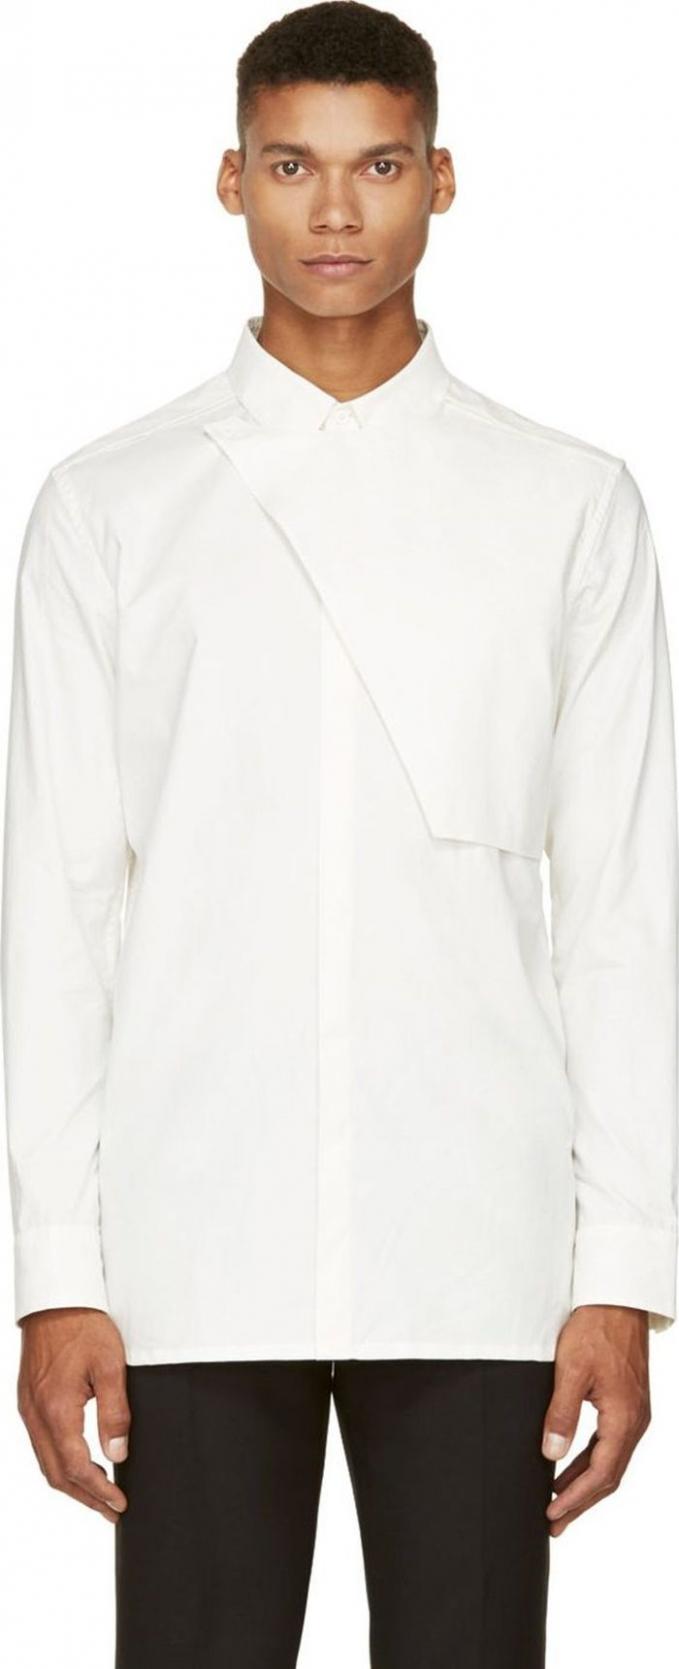 Minimalis Modern Memang akhir - akhir ini semua yang berhubungan dengan minimalis lagi tren - trennya, baju kokopun punya model minimalis lho.